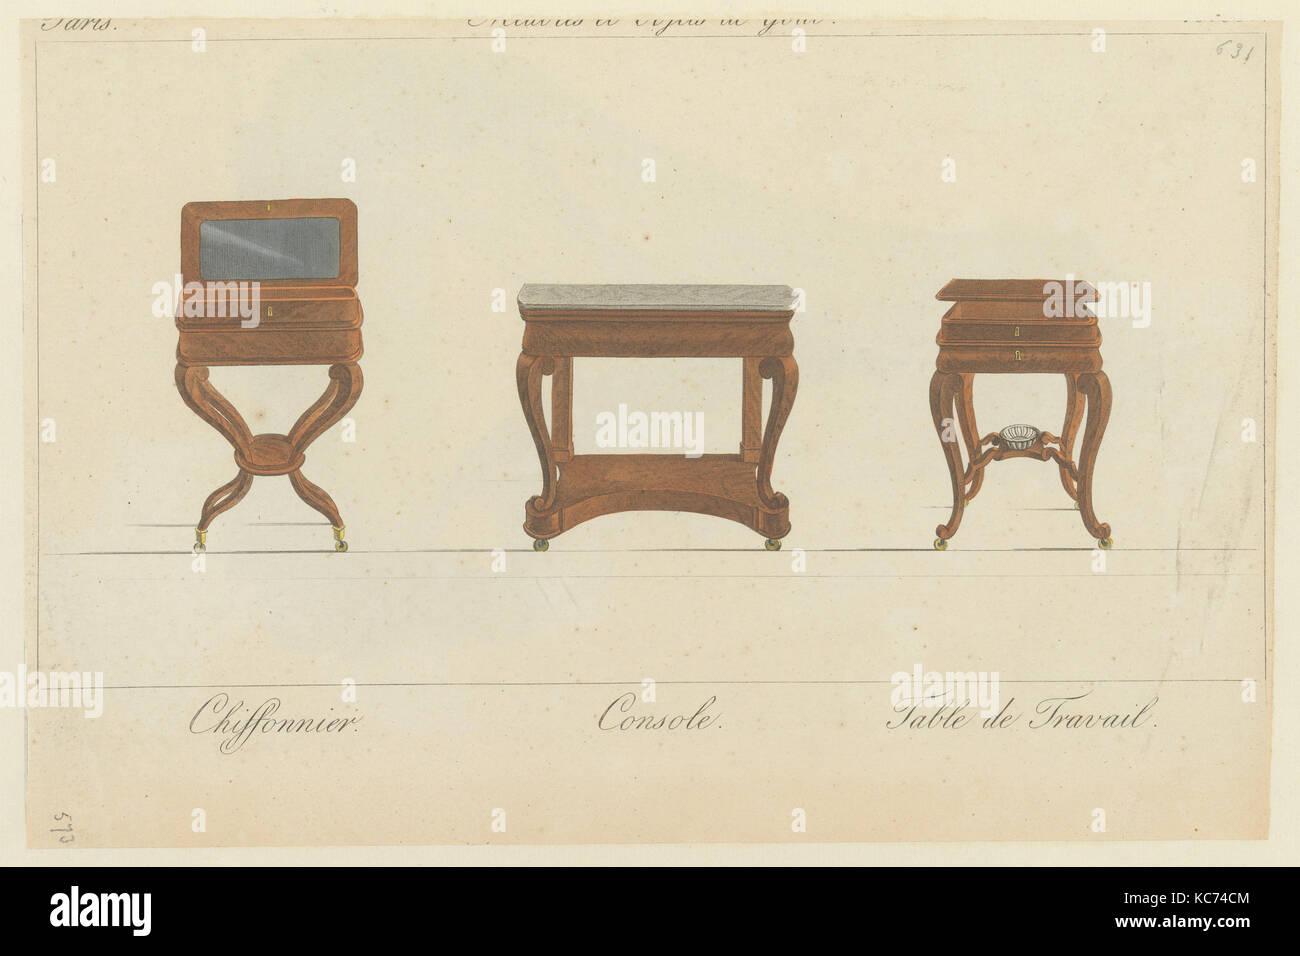 vol 3 stock photos vol 3 stock images alamy. Black Bedroom Furniture Sets. Home Design Ideas